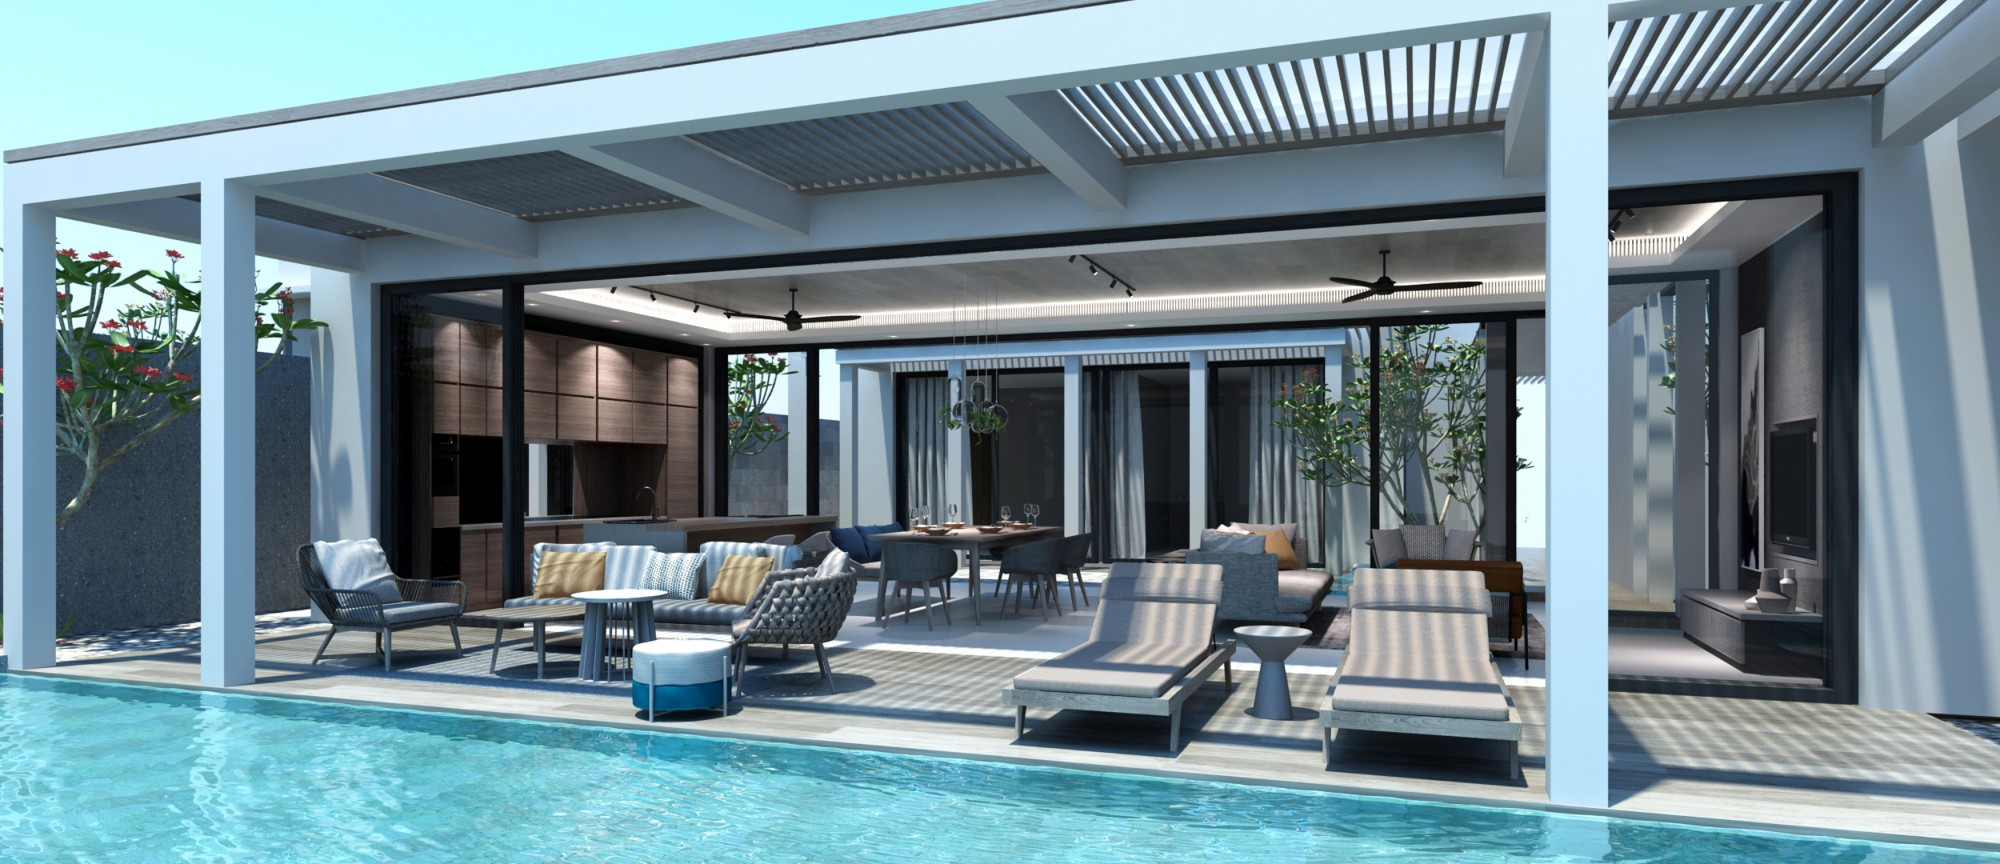 https://www.otdesign.com/wp-content/uploads/2020/11/OTdesign_Mandarin_Oriental_Bali_Residences_mandarin-best.jpg